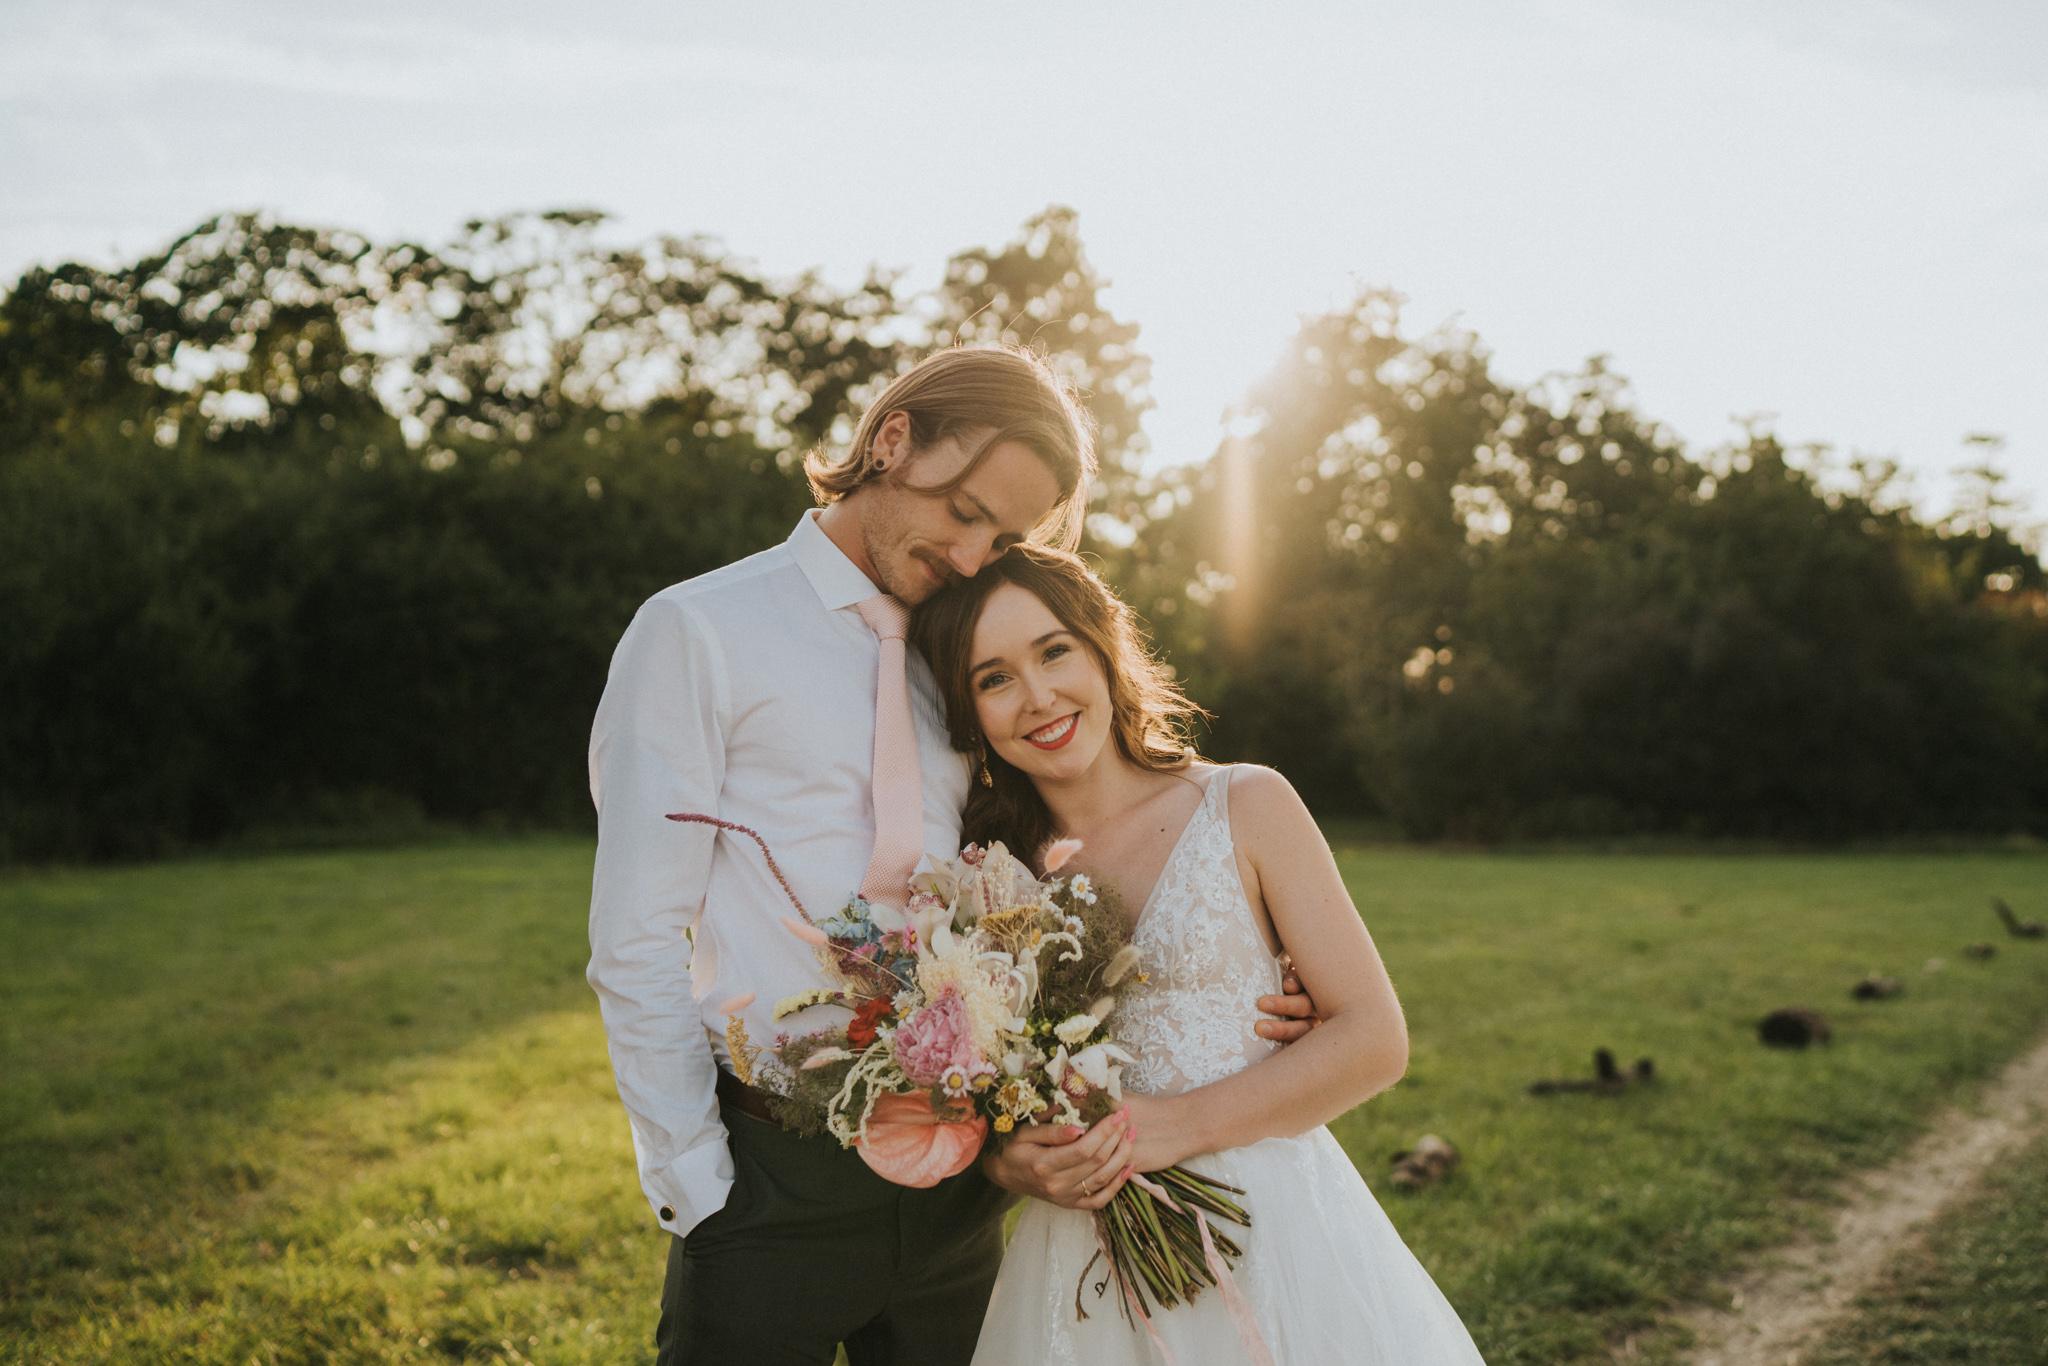 emi-Jack-boho-diy-wedding-eggington-house-grace-elizabeth-colchester-essex-alternative-wedding-photographer-suffolk-norfolk-devon (50 of 56).jpg